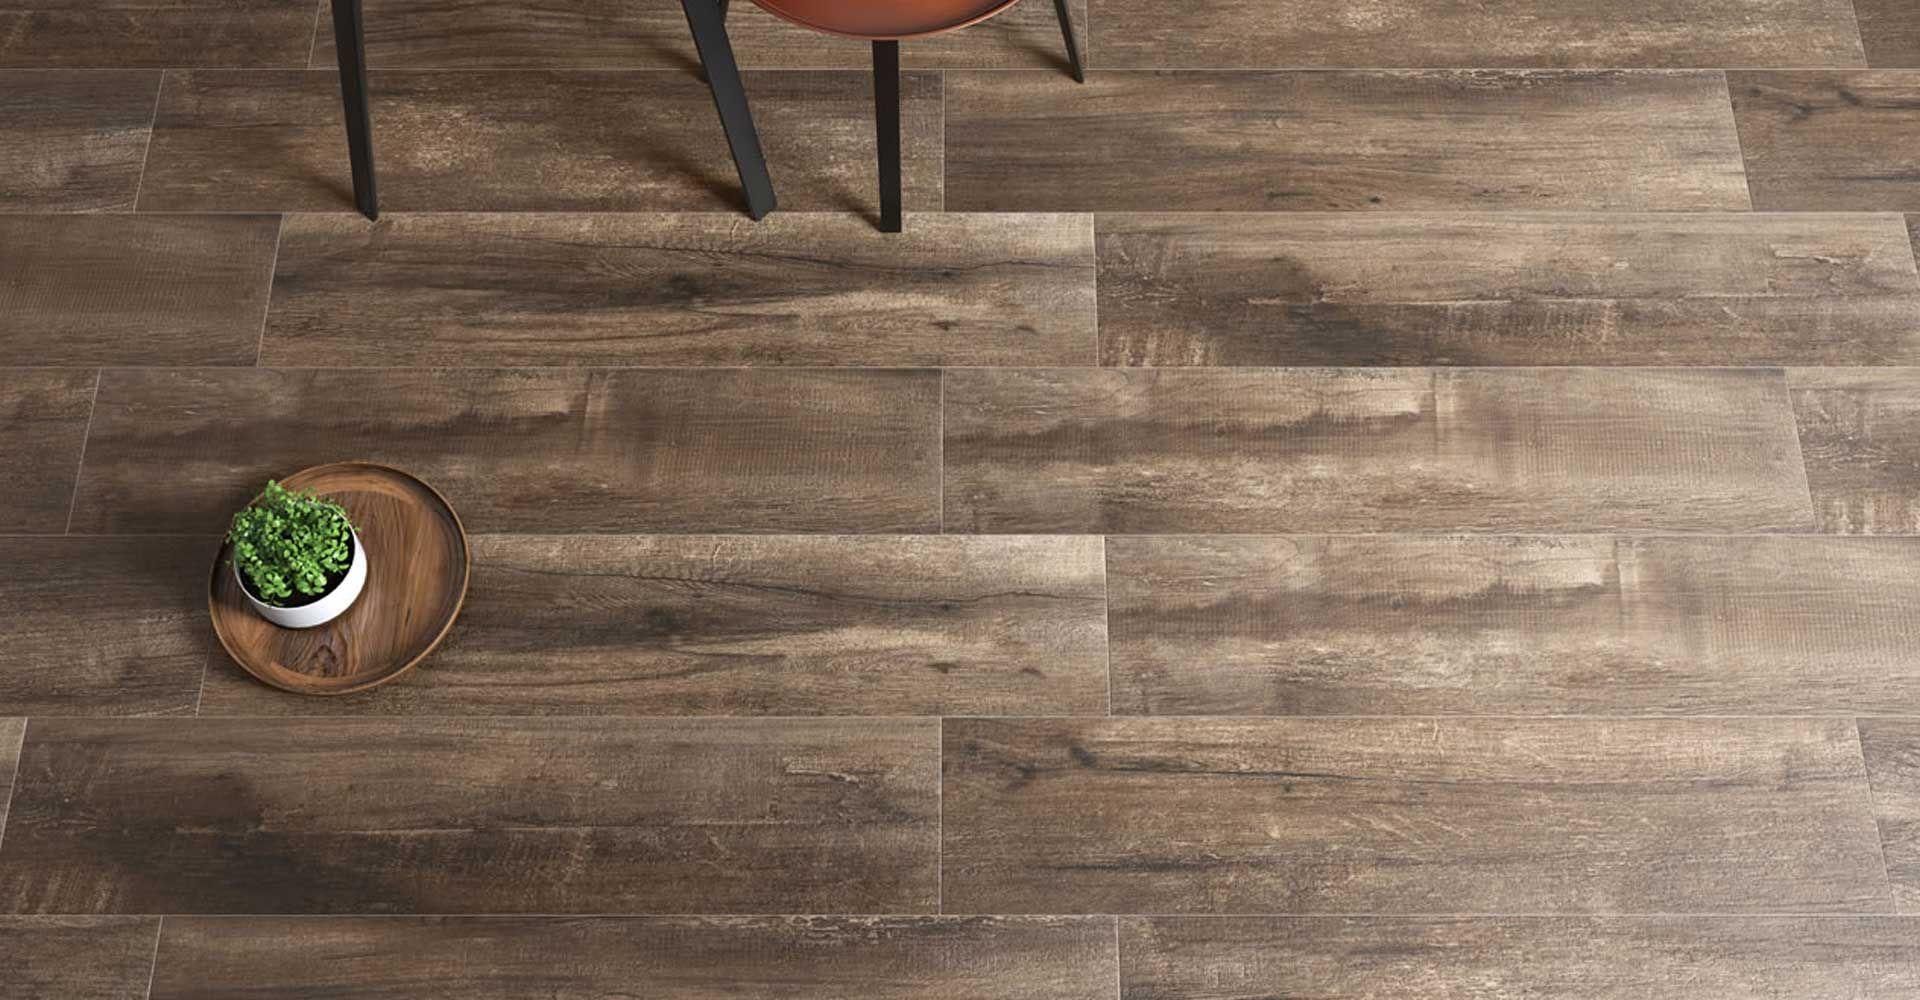 American Tile Coastal Porcelain Tile Porcelaintile Wood Look Tile Tiletuesday Tiletoday Americantileandstone Ceramic Tiles Rustic Flooring Ceramic Floor